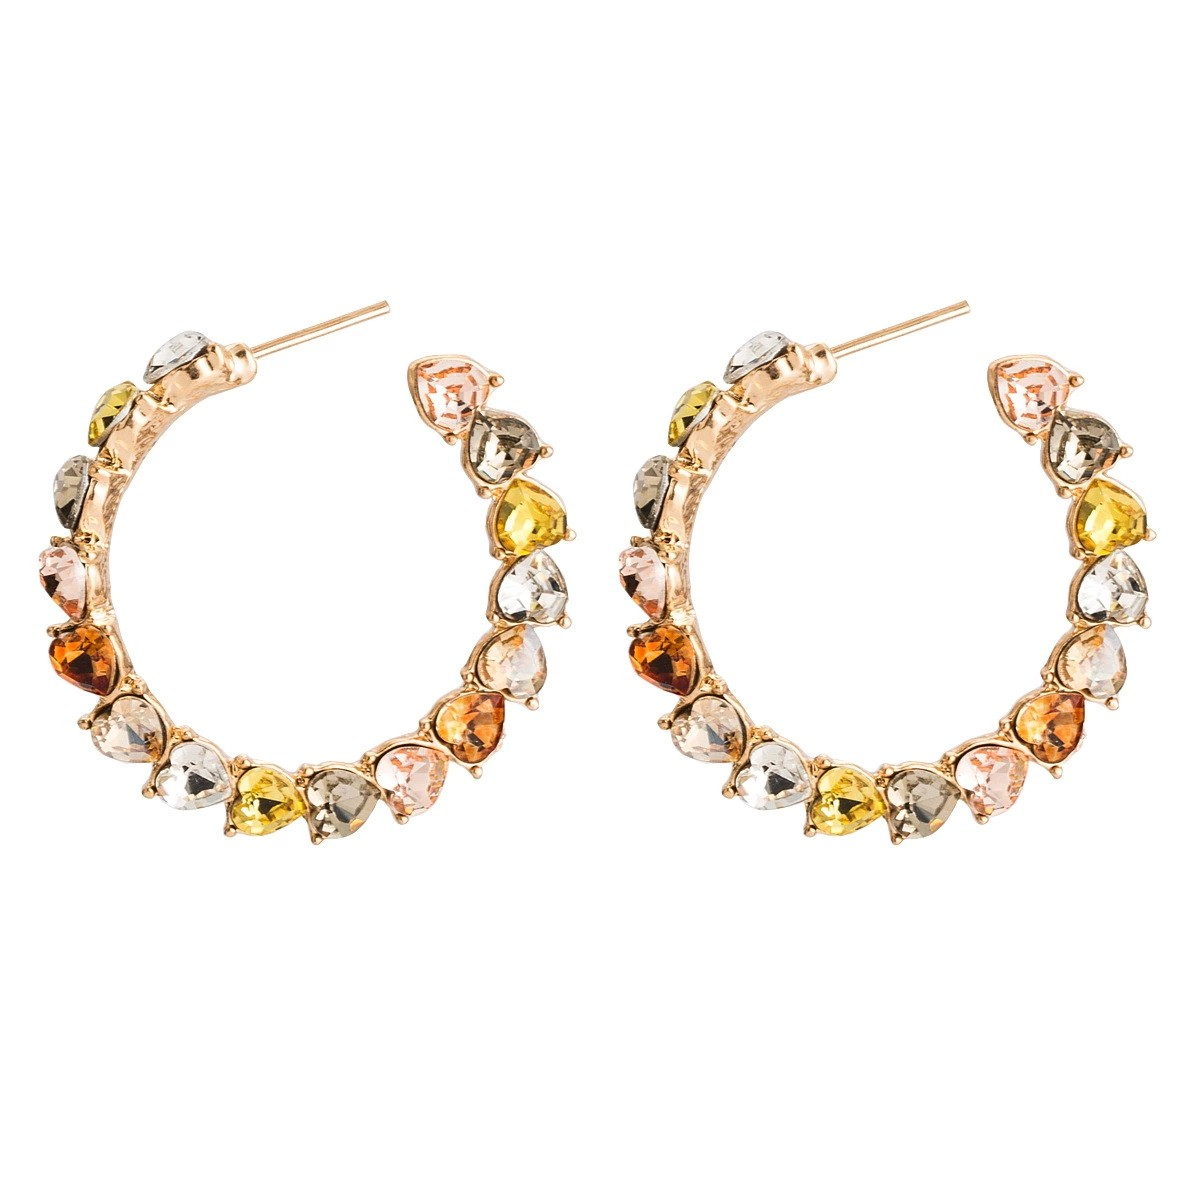 0496dbde7 Big round loop stones earrings studs multicolor diam 4 cm exclusive by  Axelles Fashion ref 18065